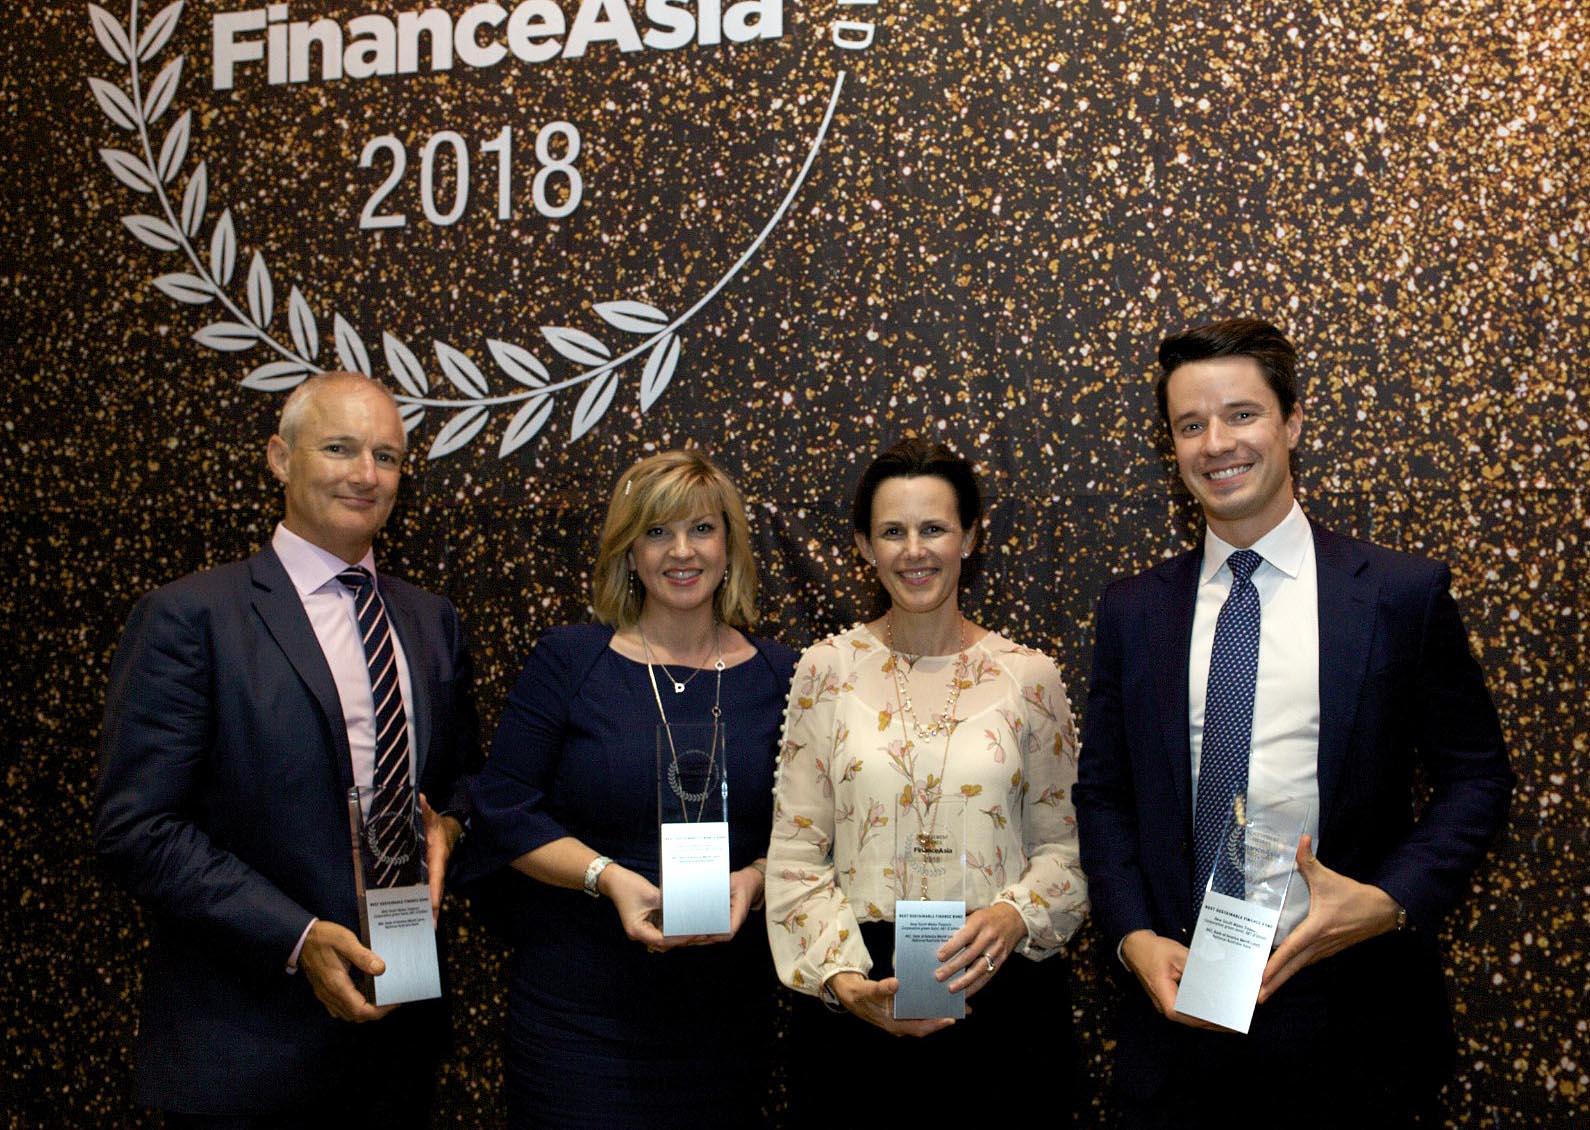 David Jenkins of National Australia Bank, Fiona Trigona of